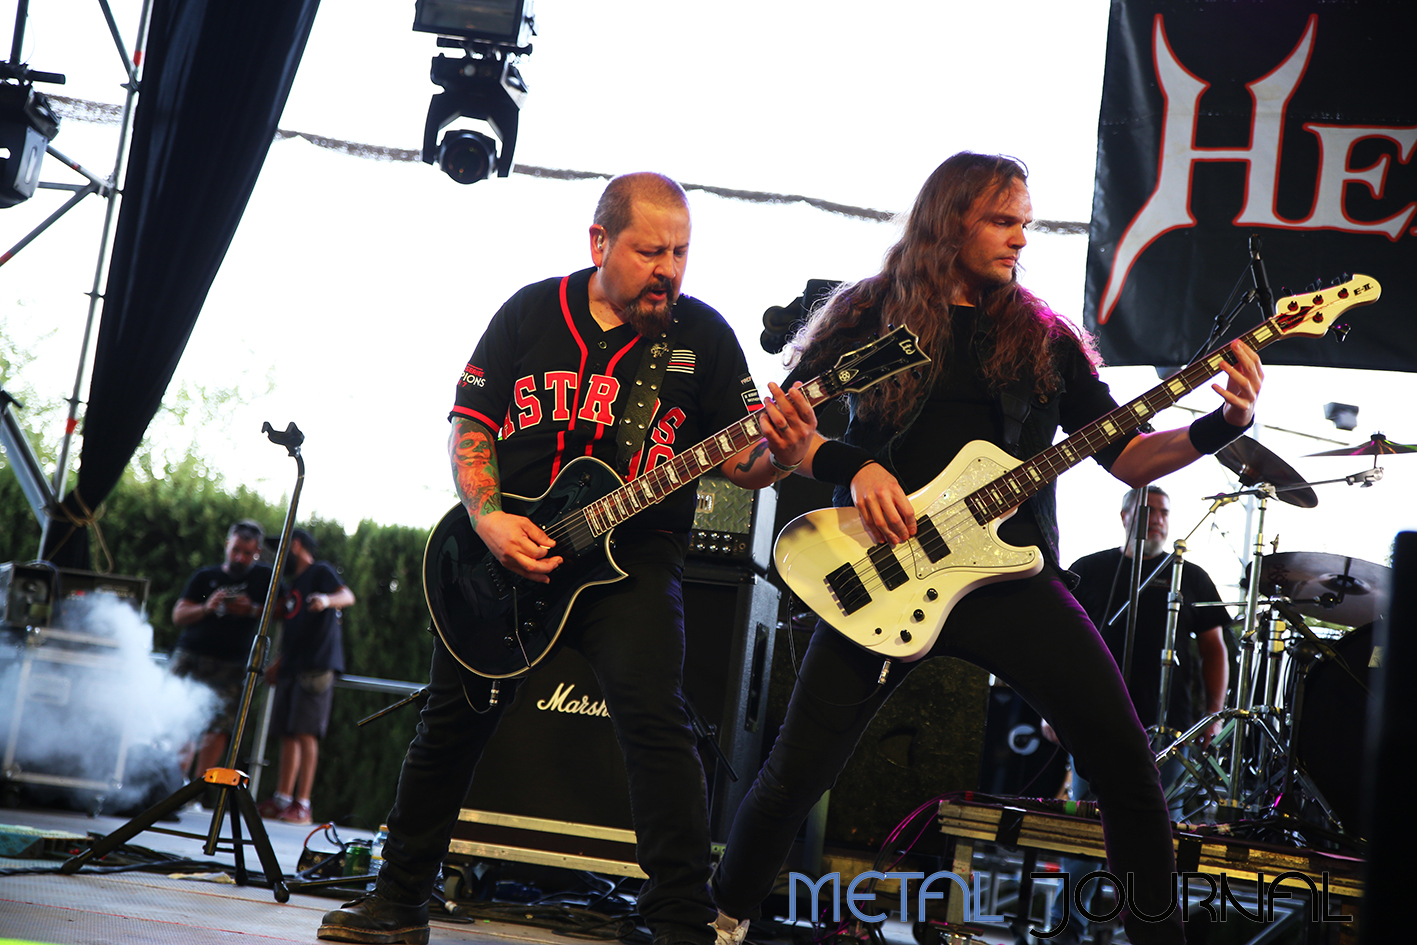 helstar - leyendas del rock 2019 metal journal pic 2